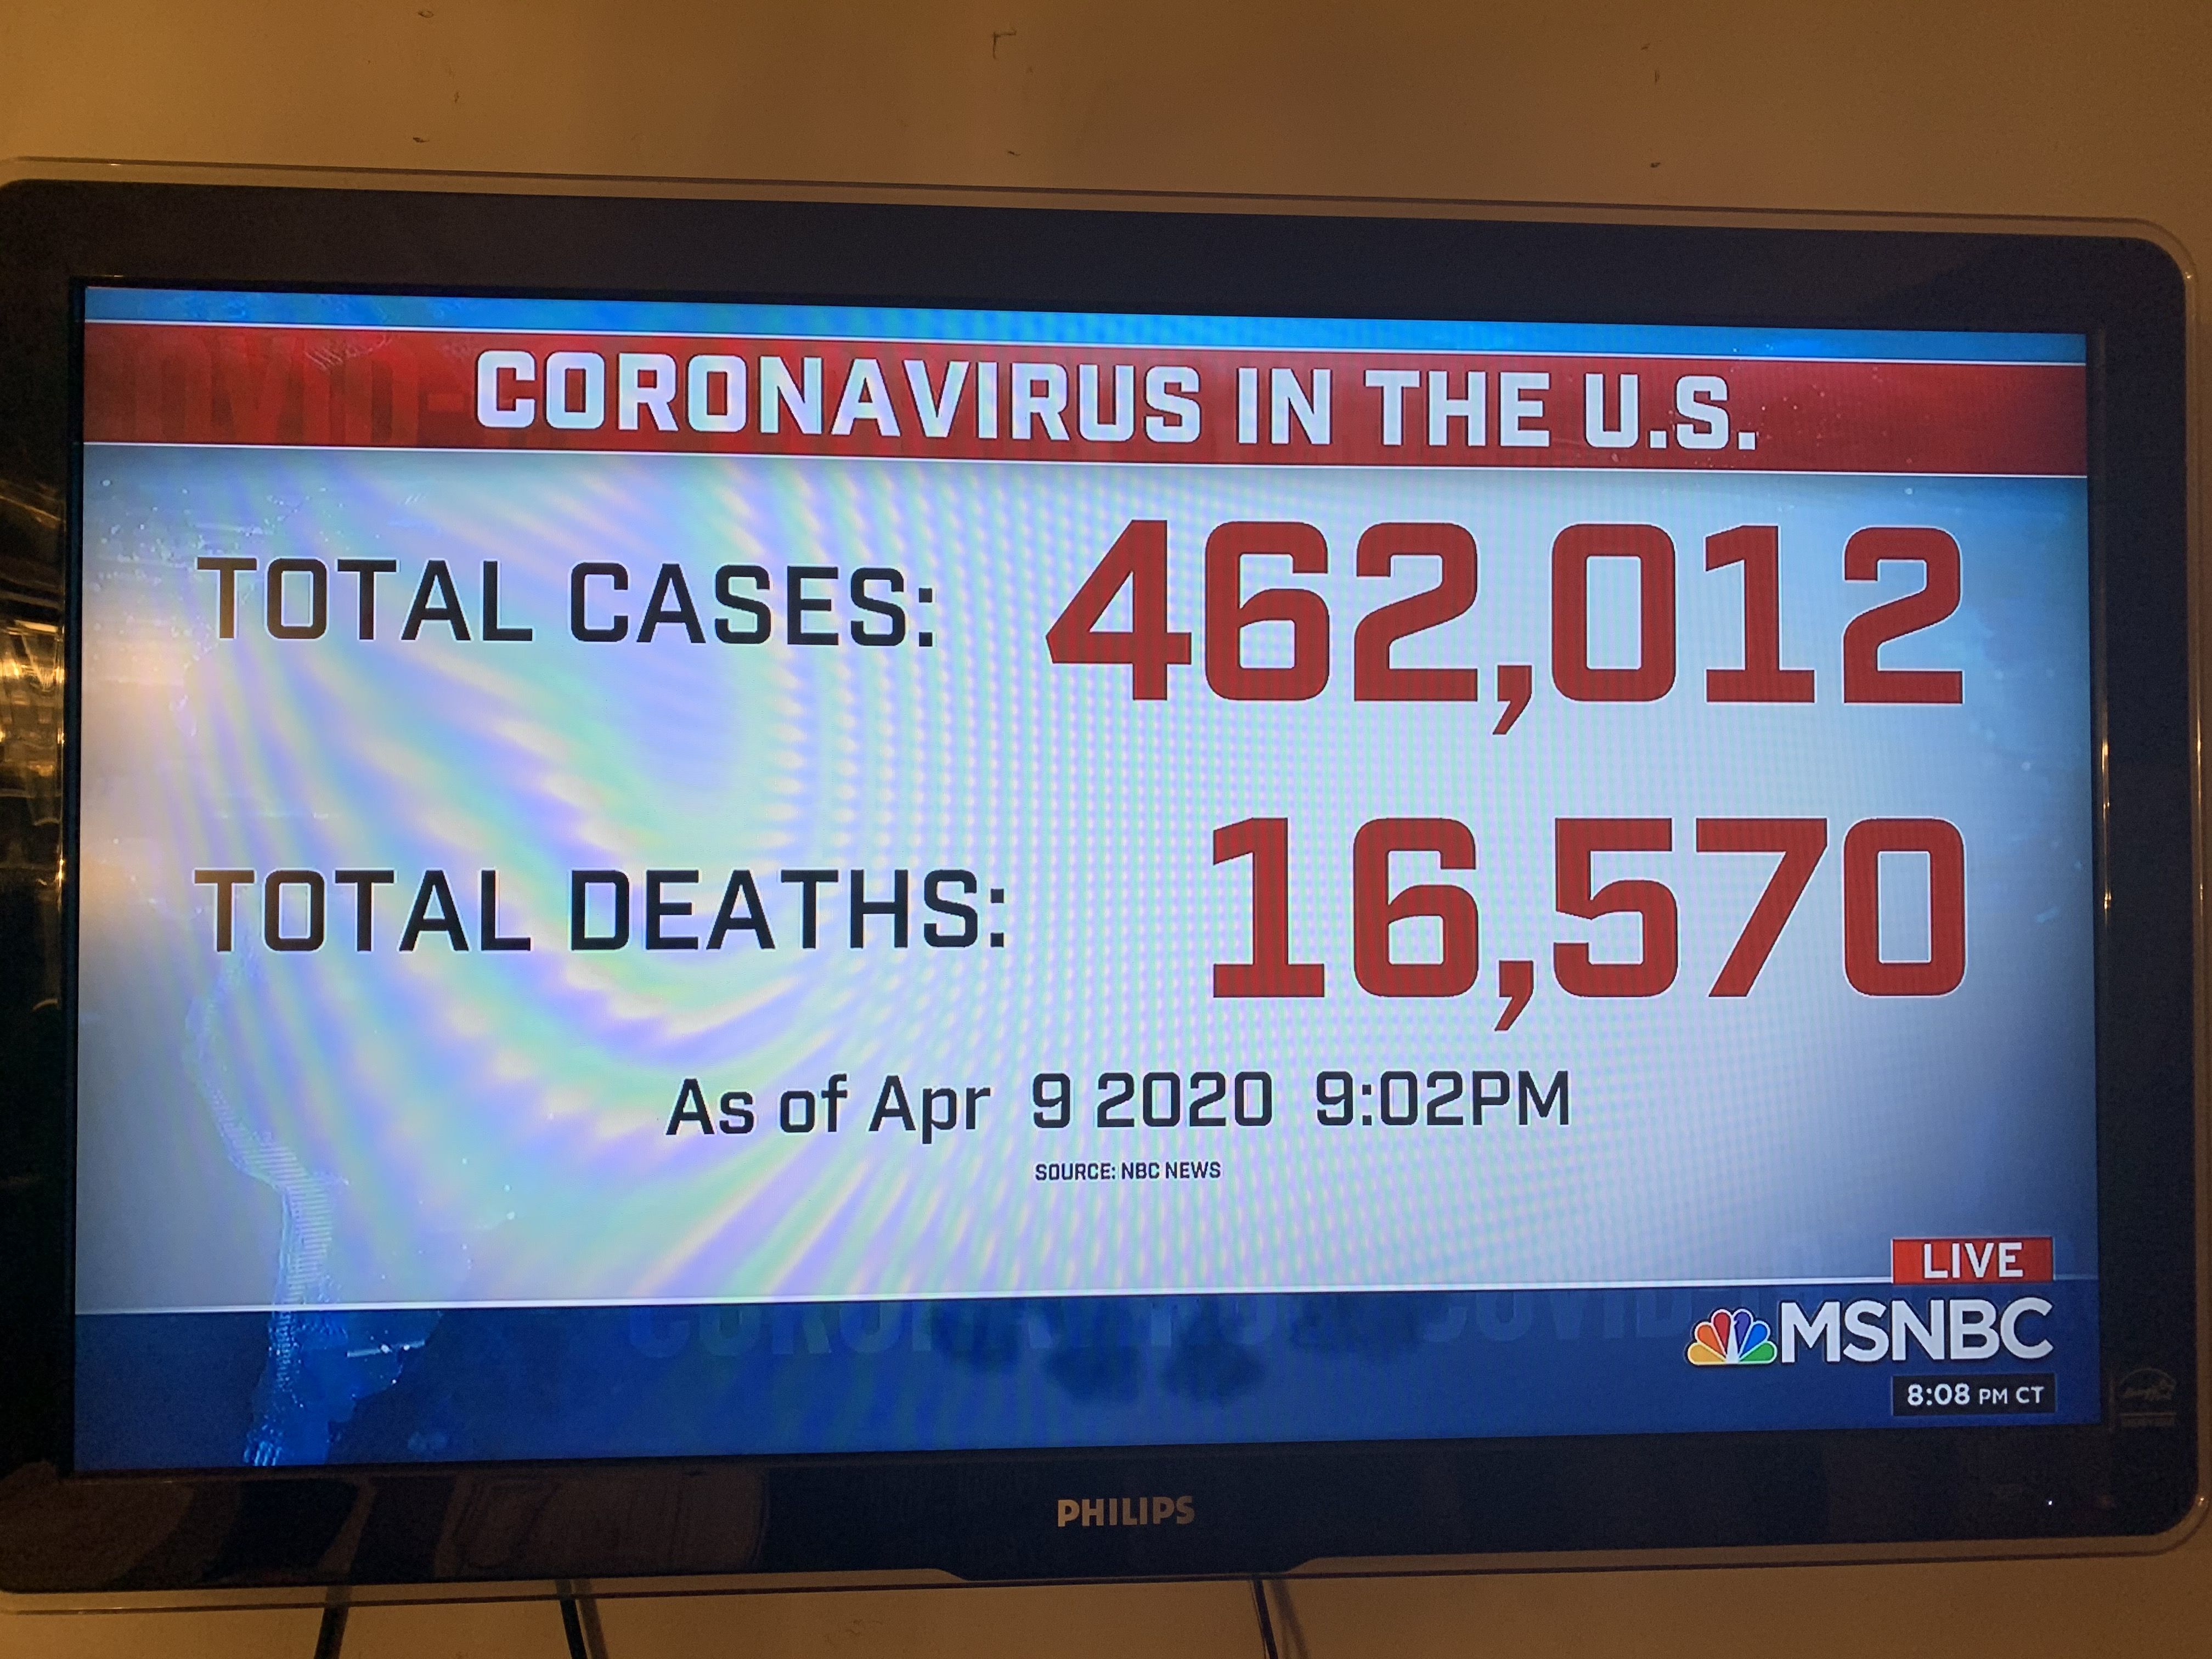 Pin on COVID19 CORONAVIRUS FYI because I care